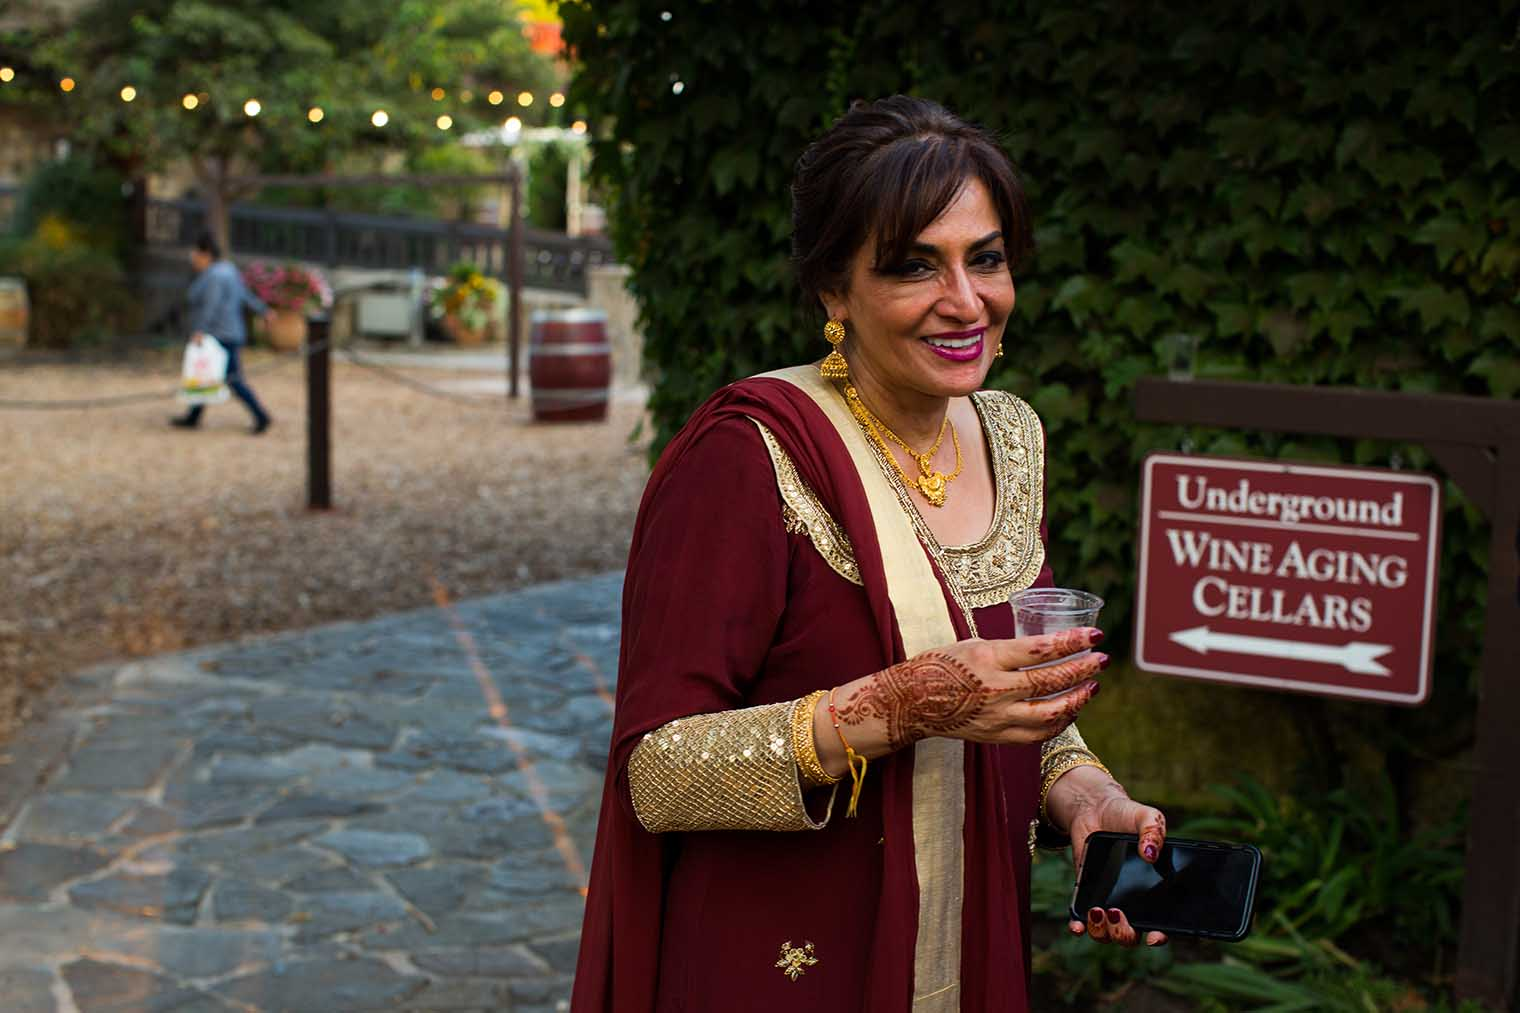 V. Sattui Winery Candid Photo at Wedding